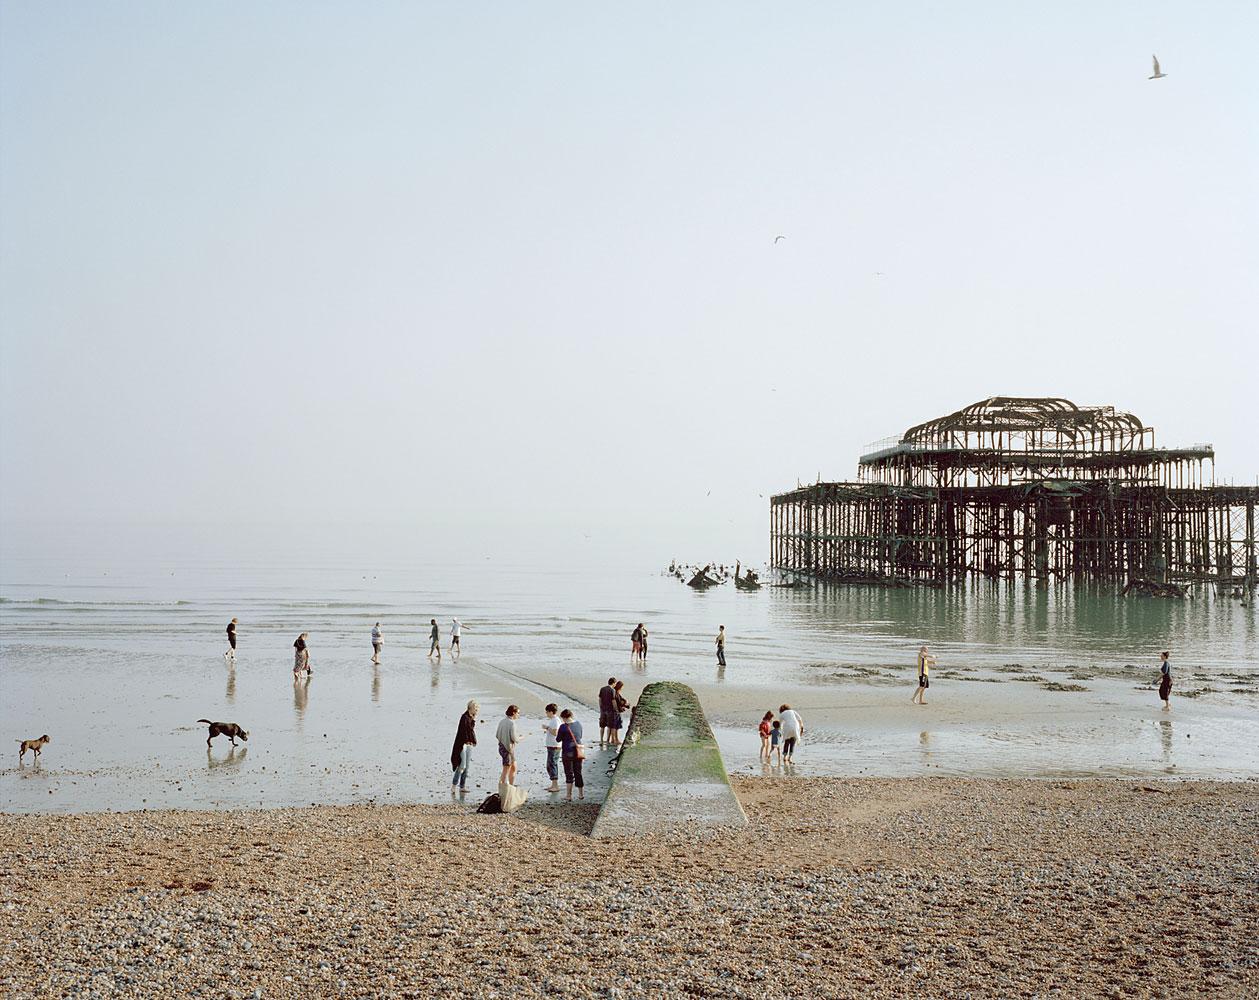 Brighton West Pier, East Sussex, April 2011